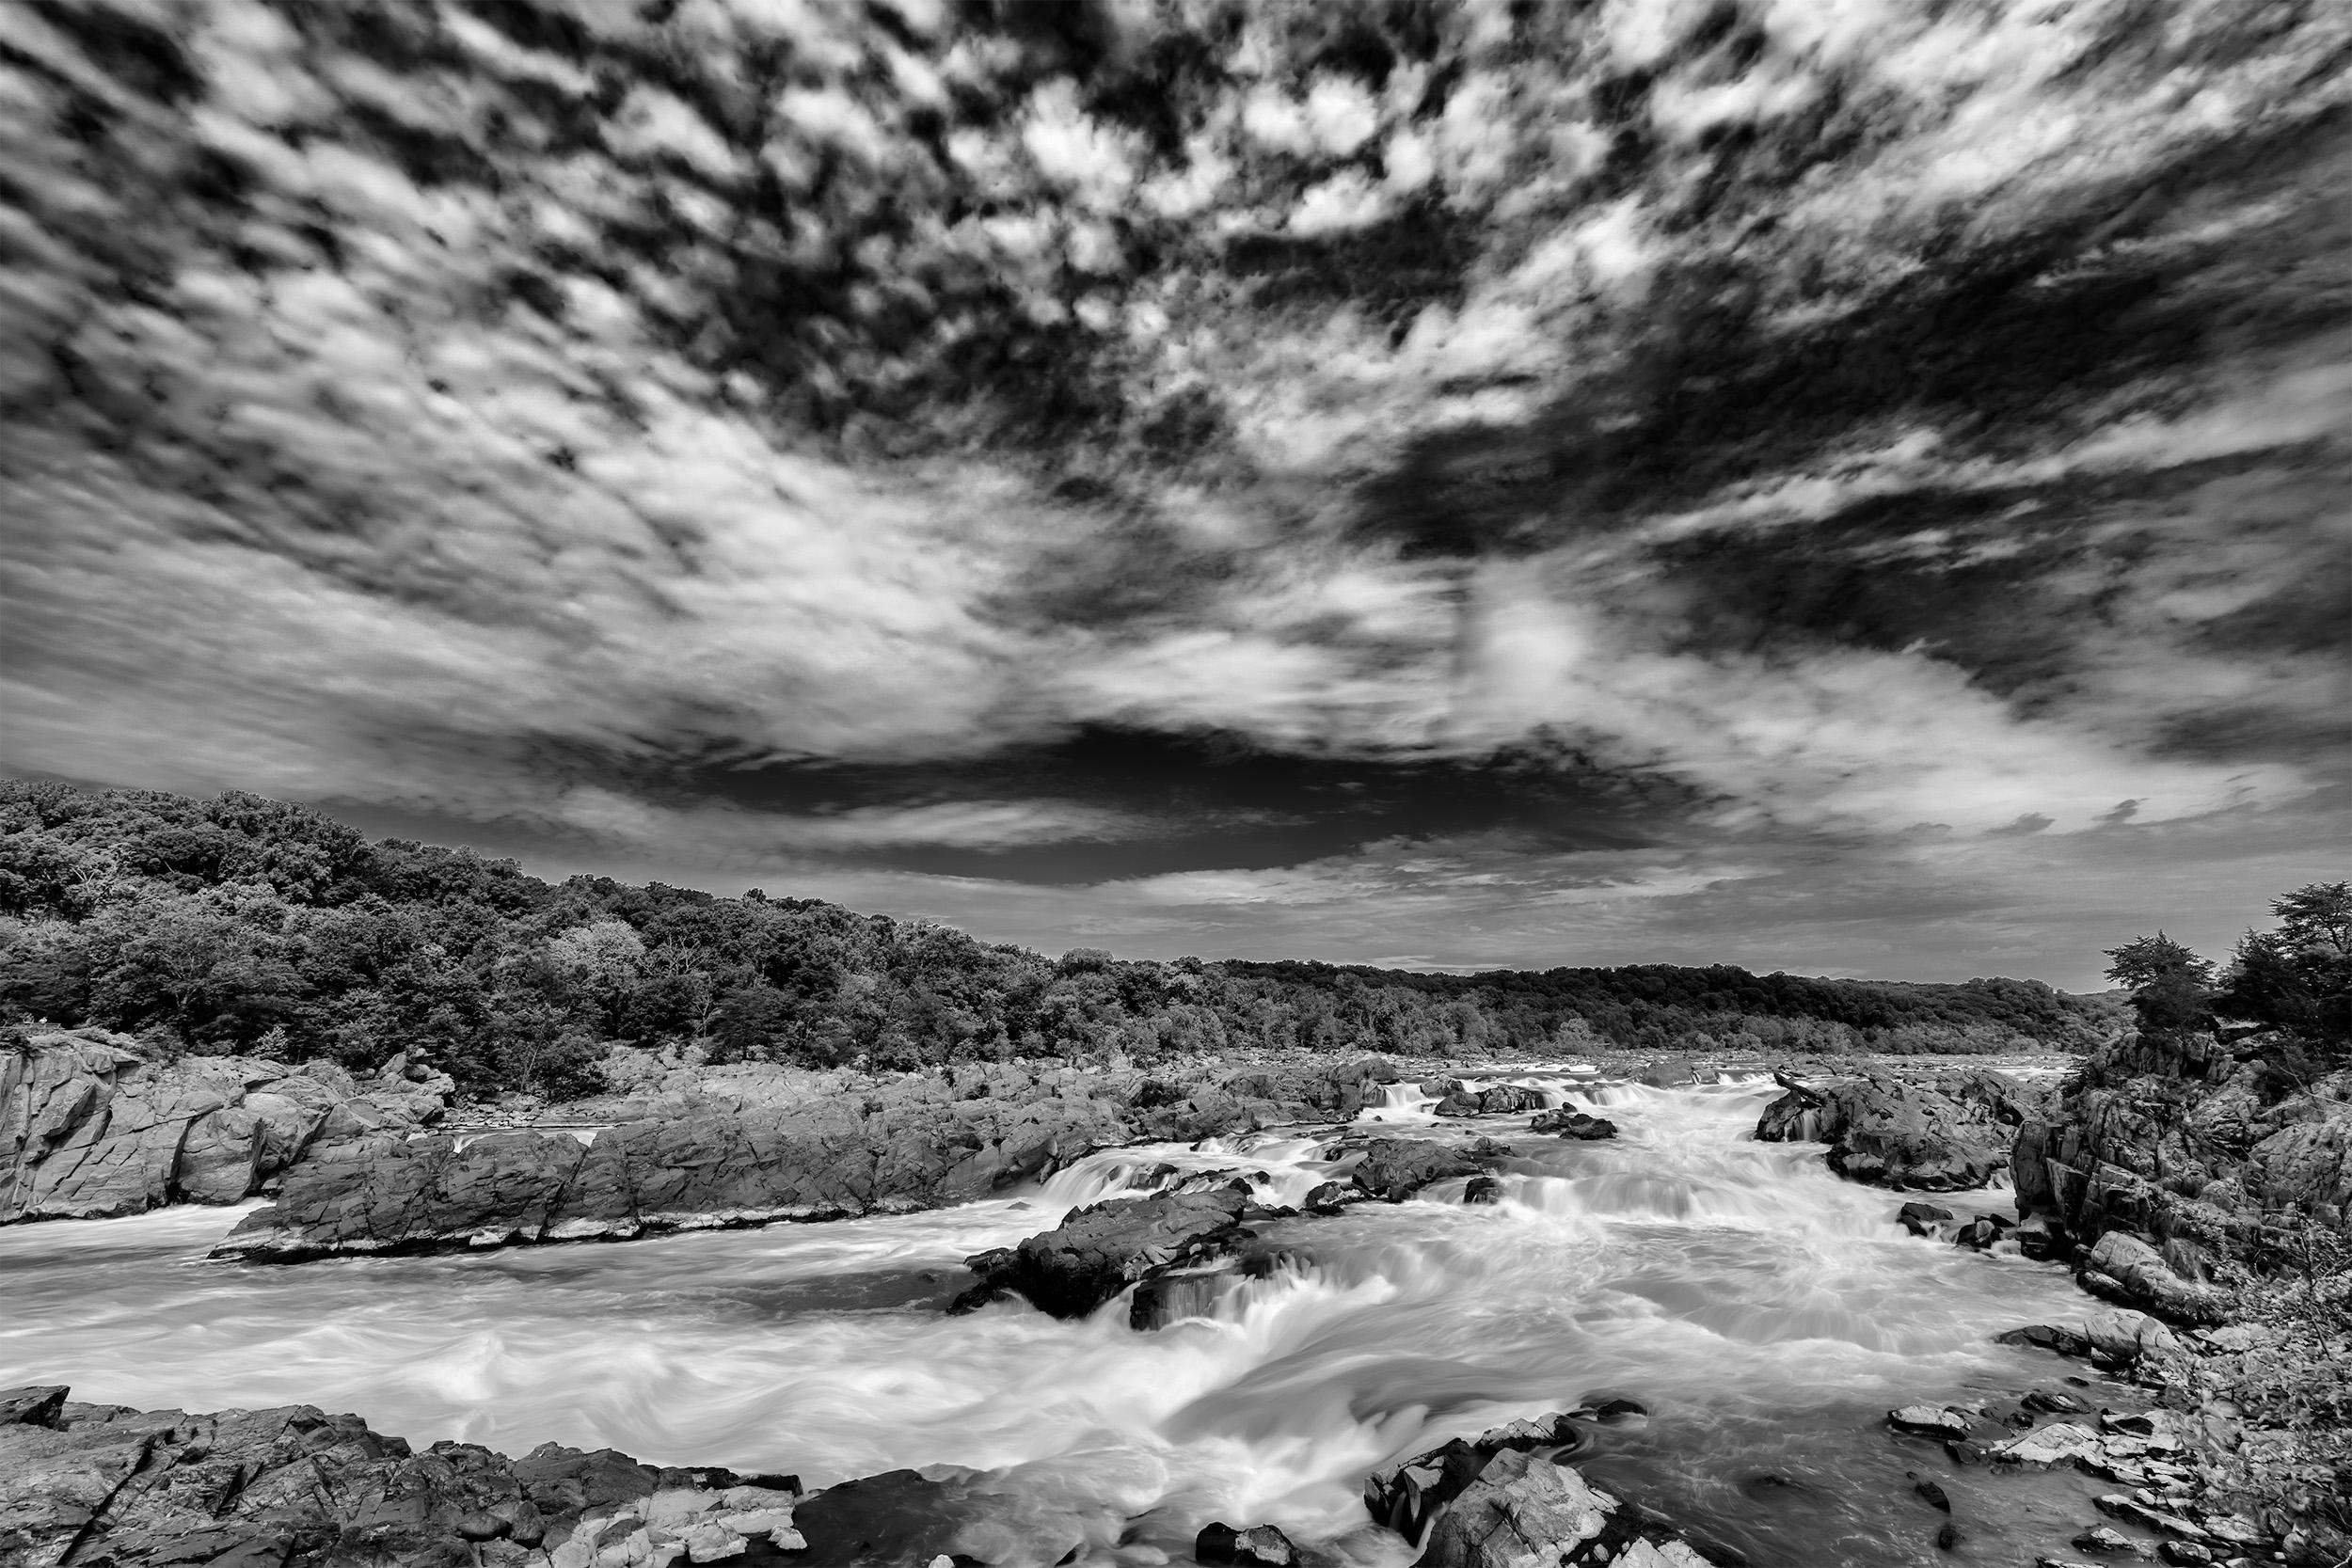 190530 Great Falls 20-1 bw.jpg